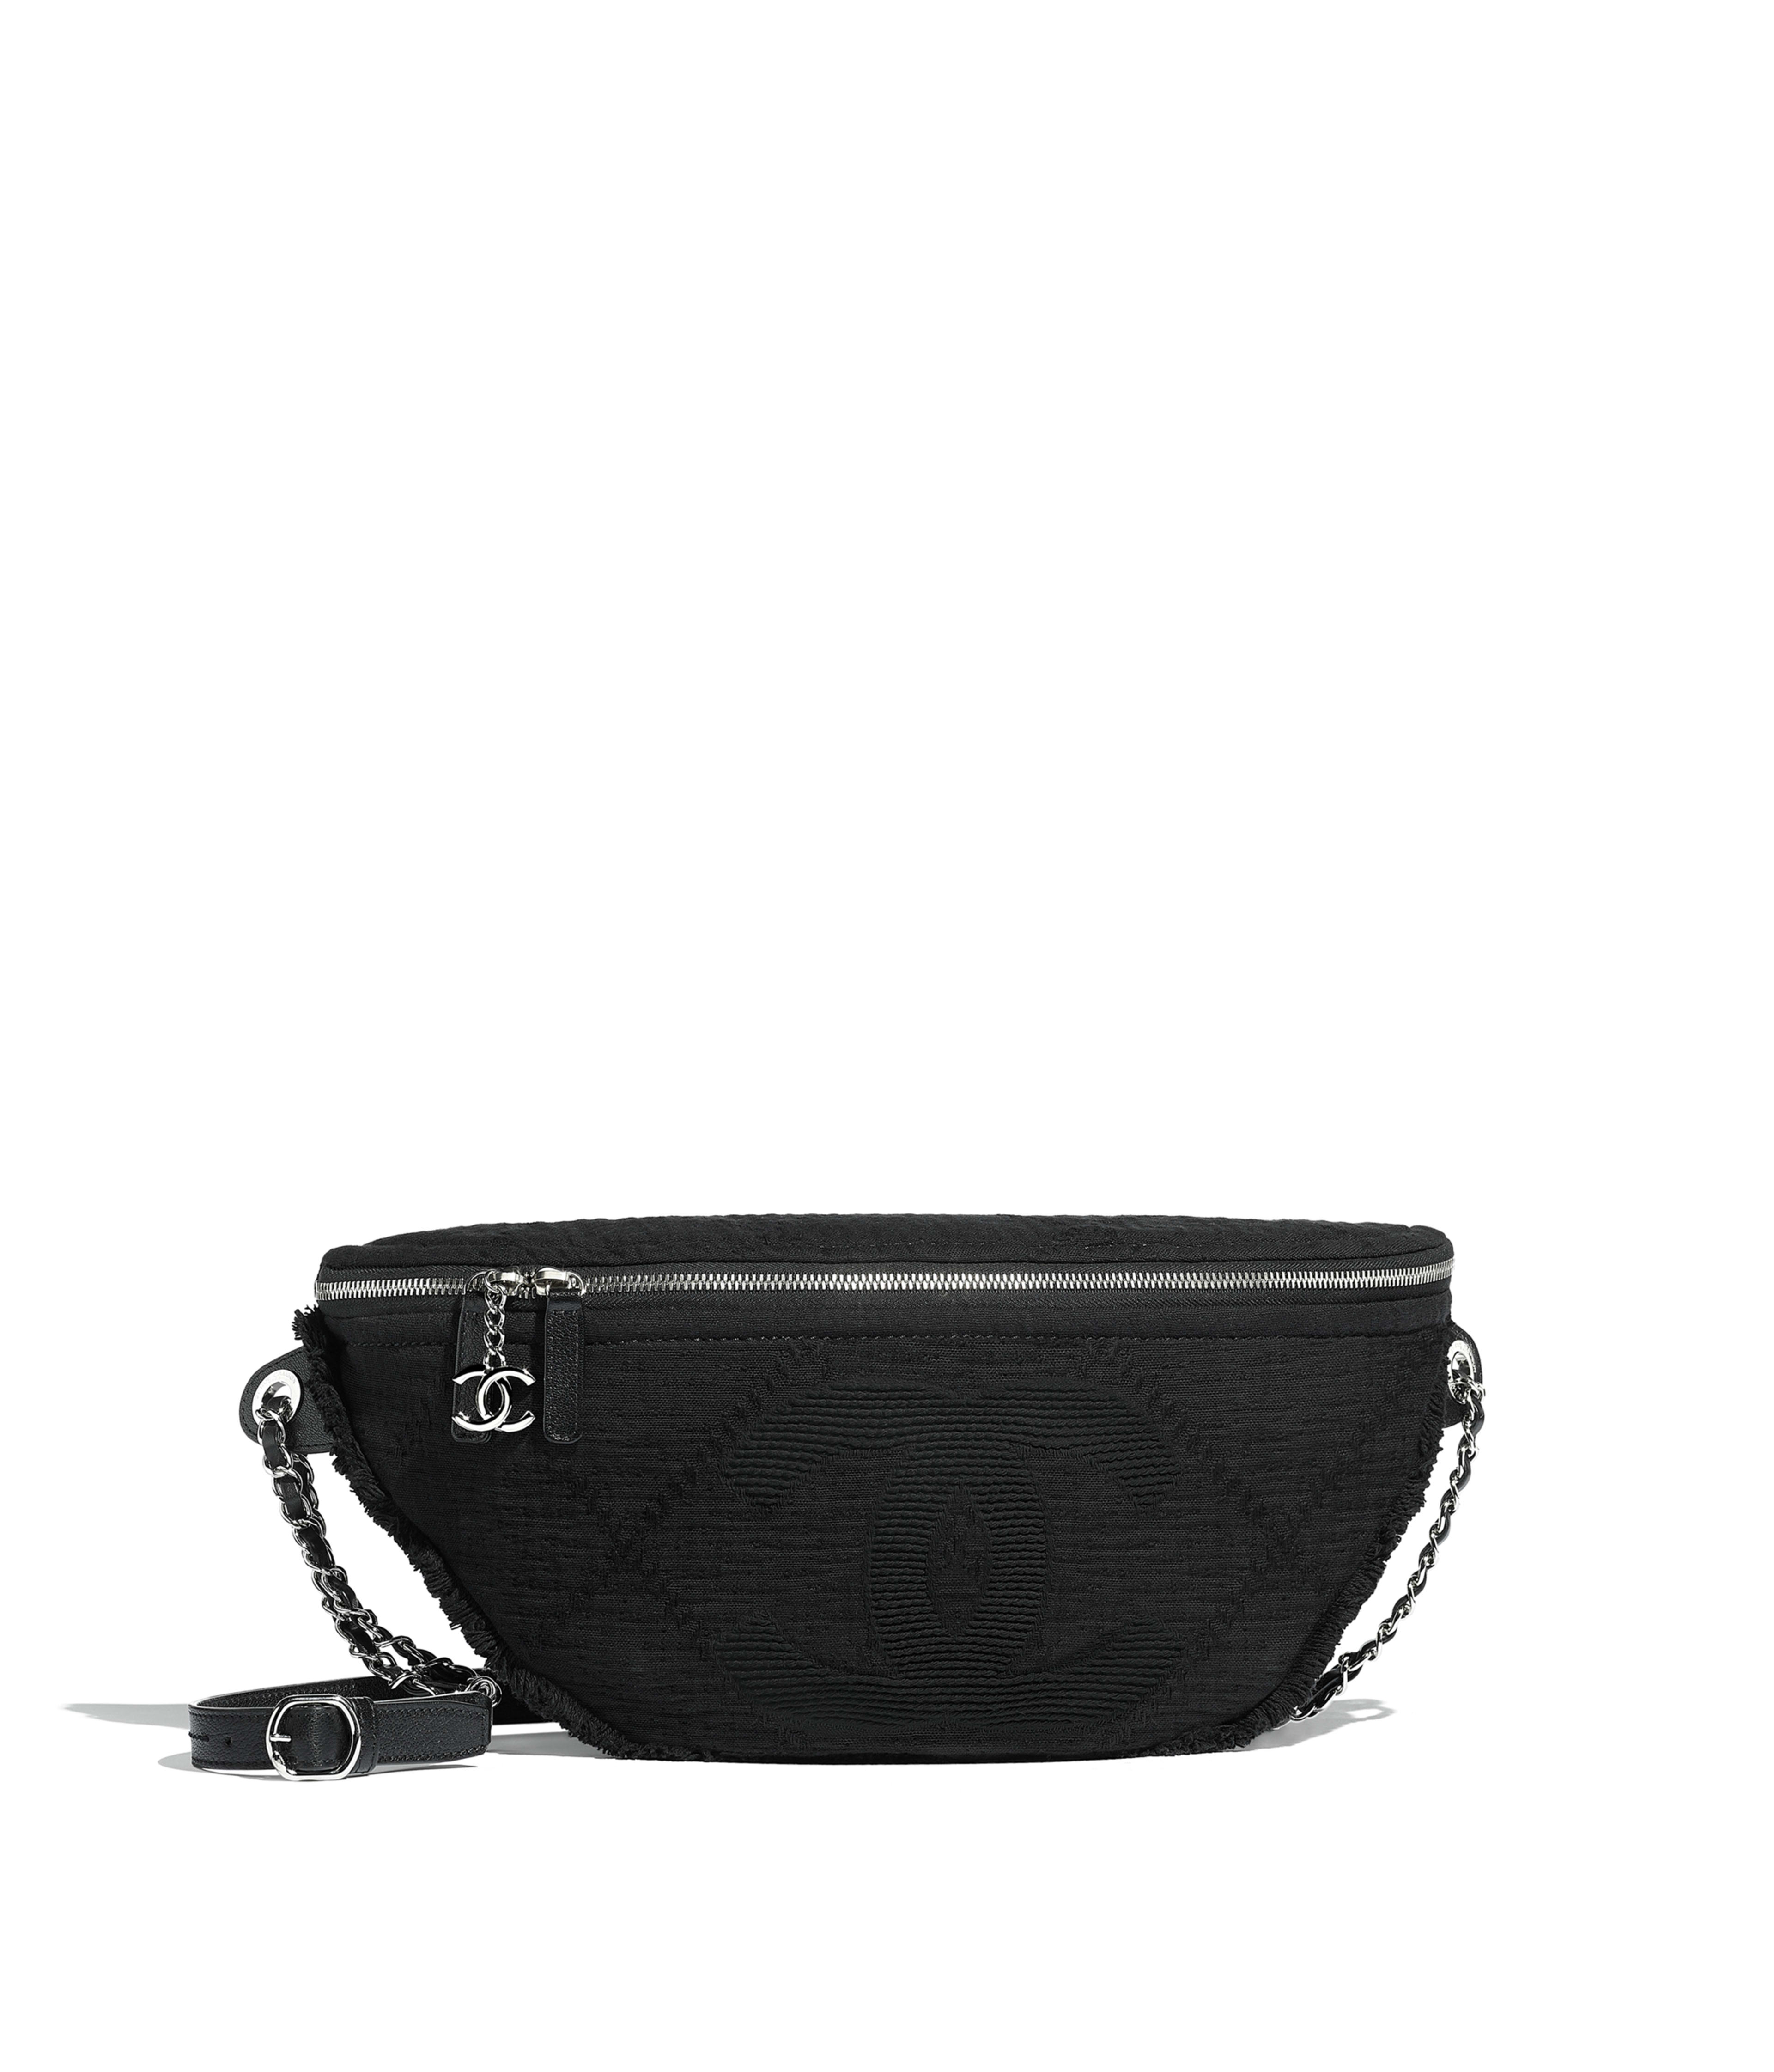 d40805a12def Waist Bag Mixed Fibers, Goatskin, Silver-Tone Metal, Black Ref.  AS0315B0010794305